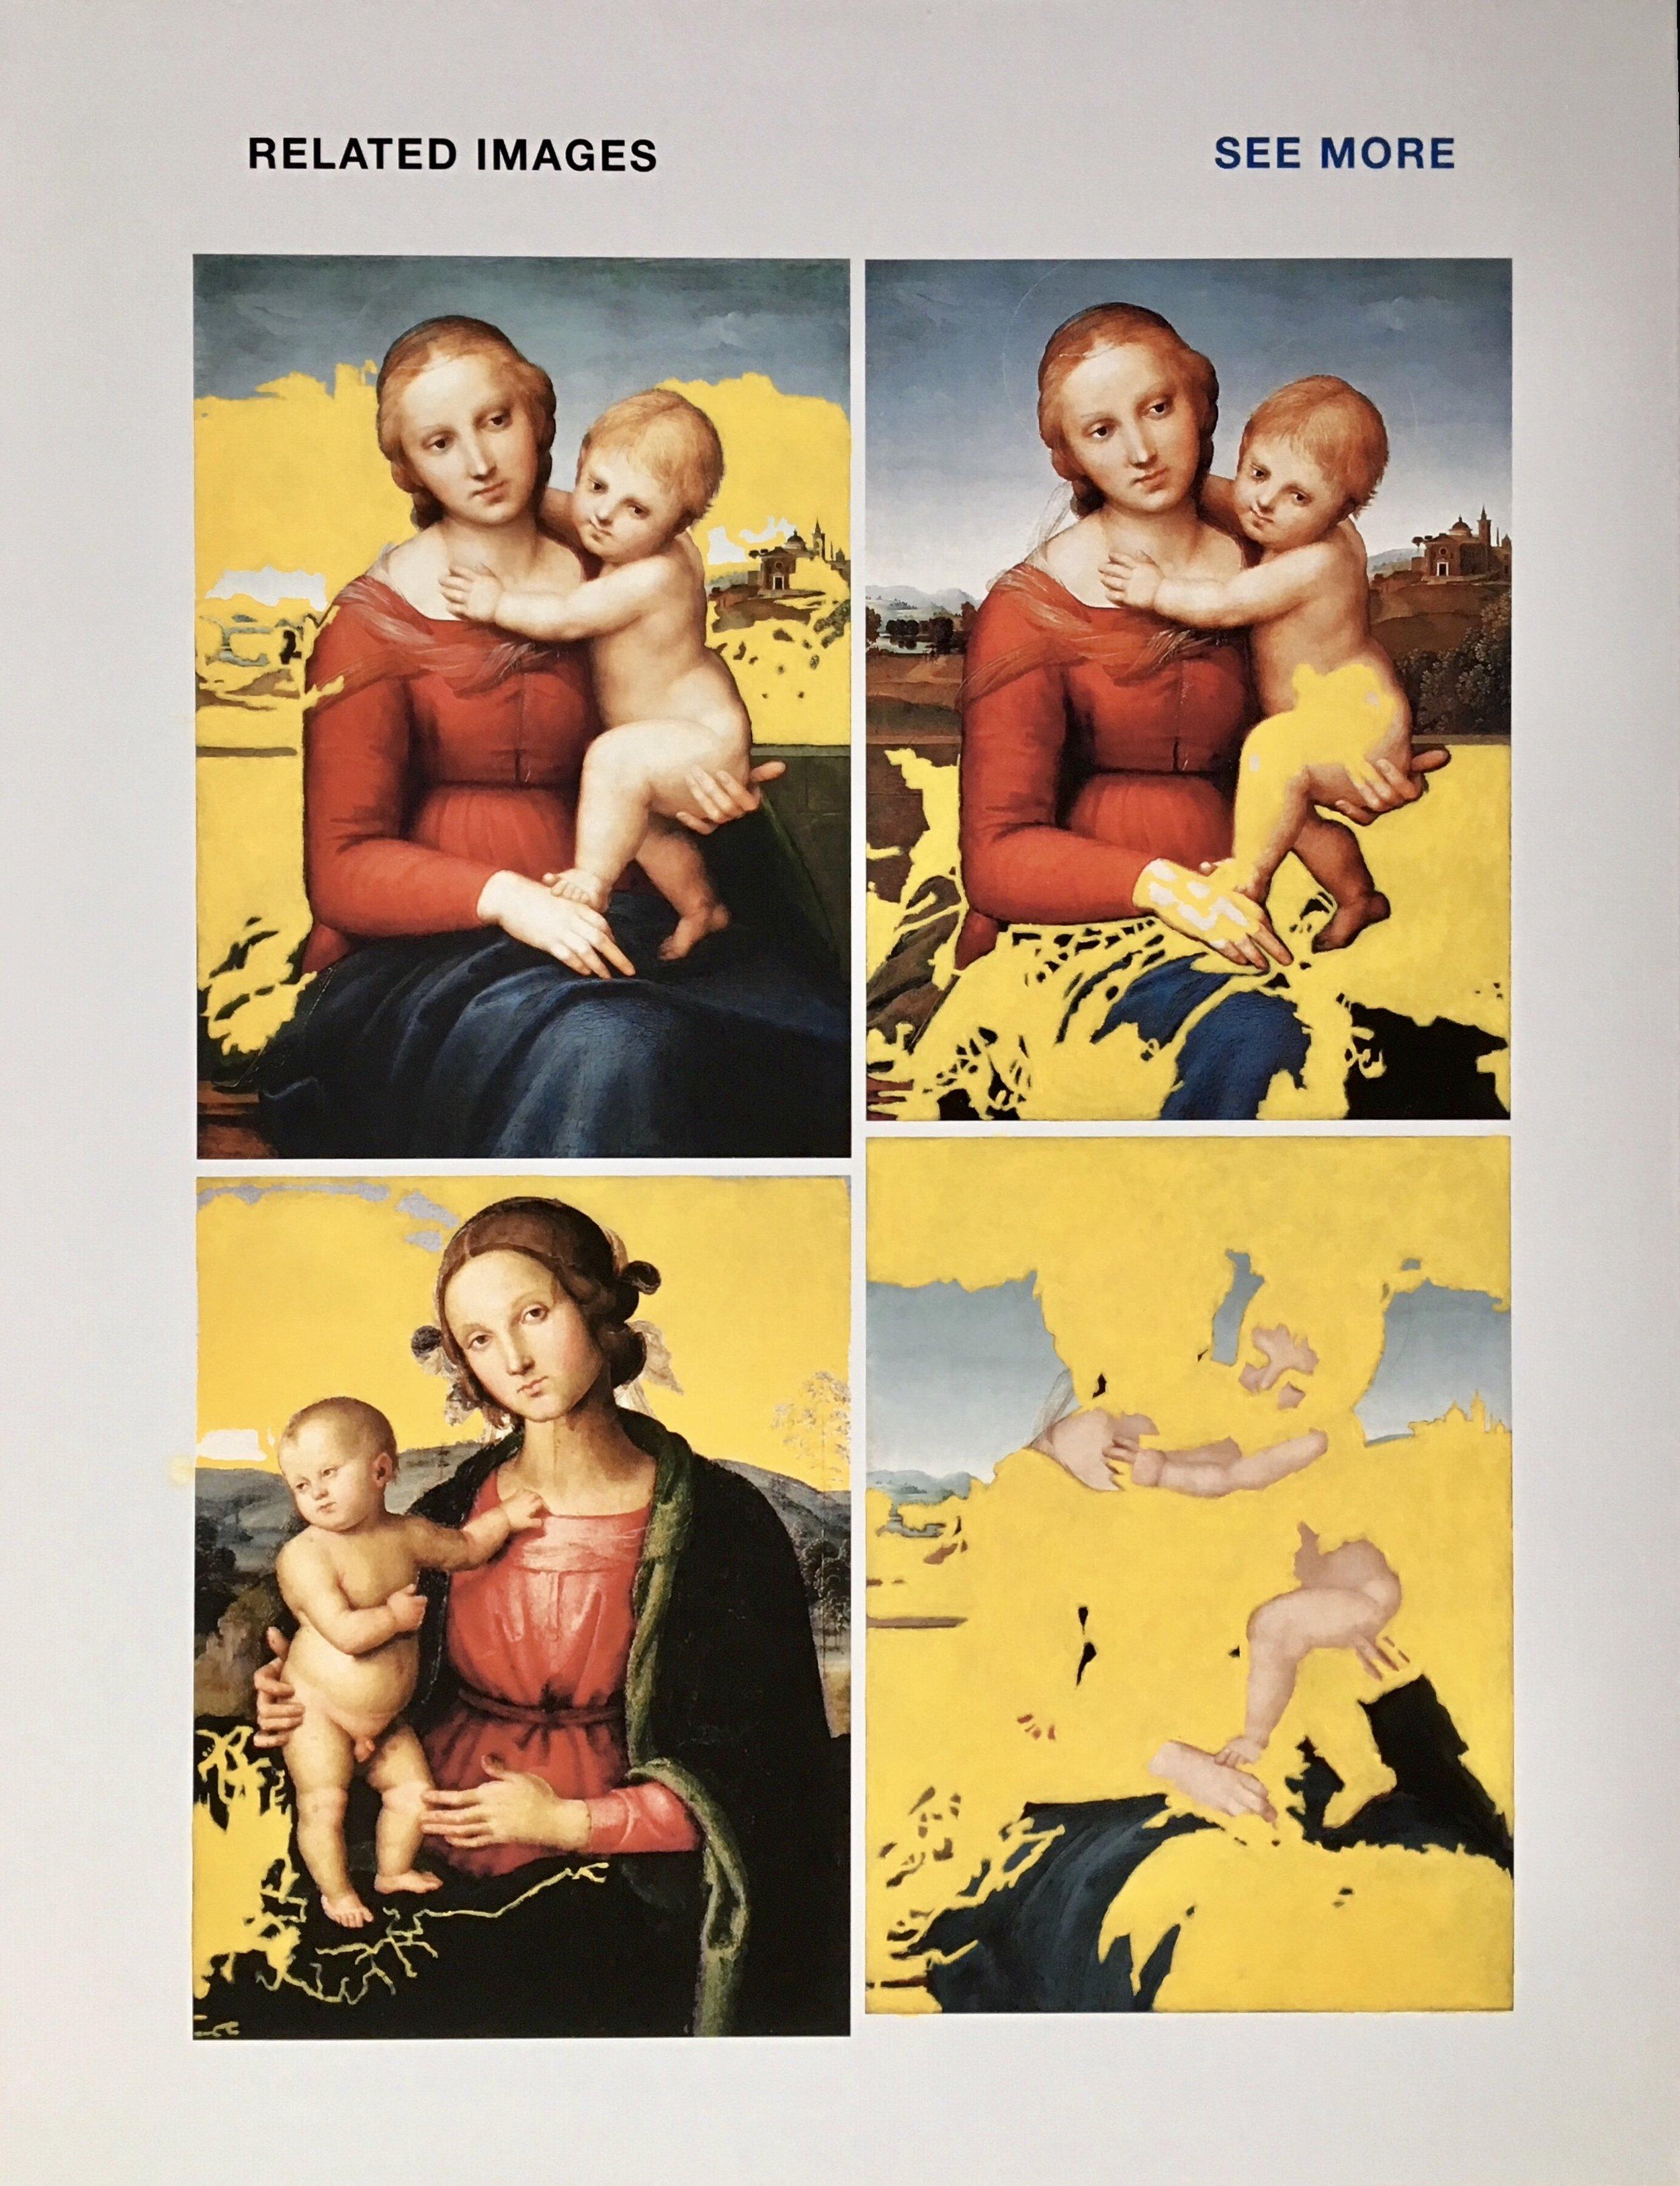 """q=raphael+madonna"", 100 cm x 130 cm, inkjet and acrylic paint on canvas."